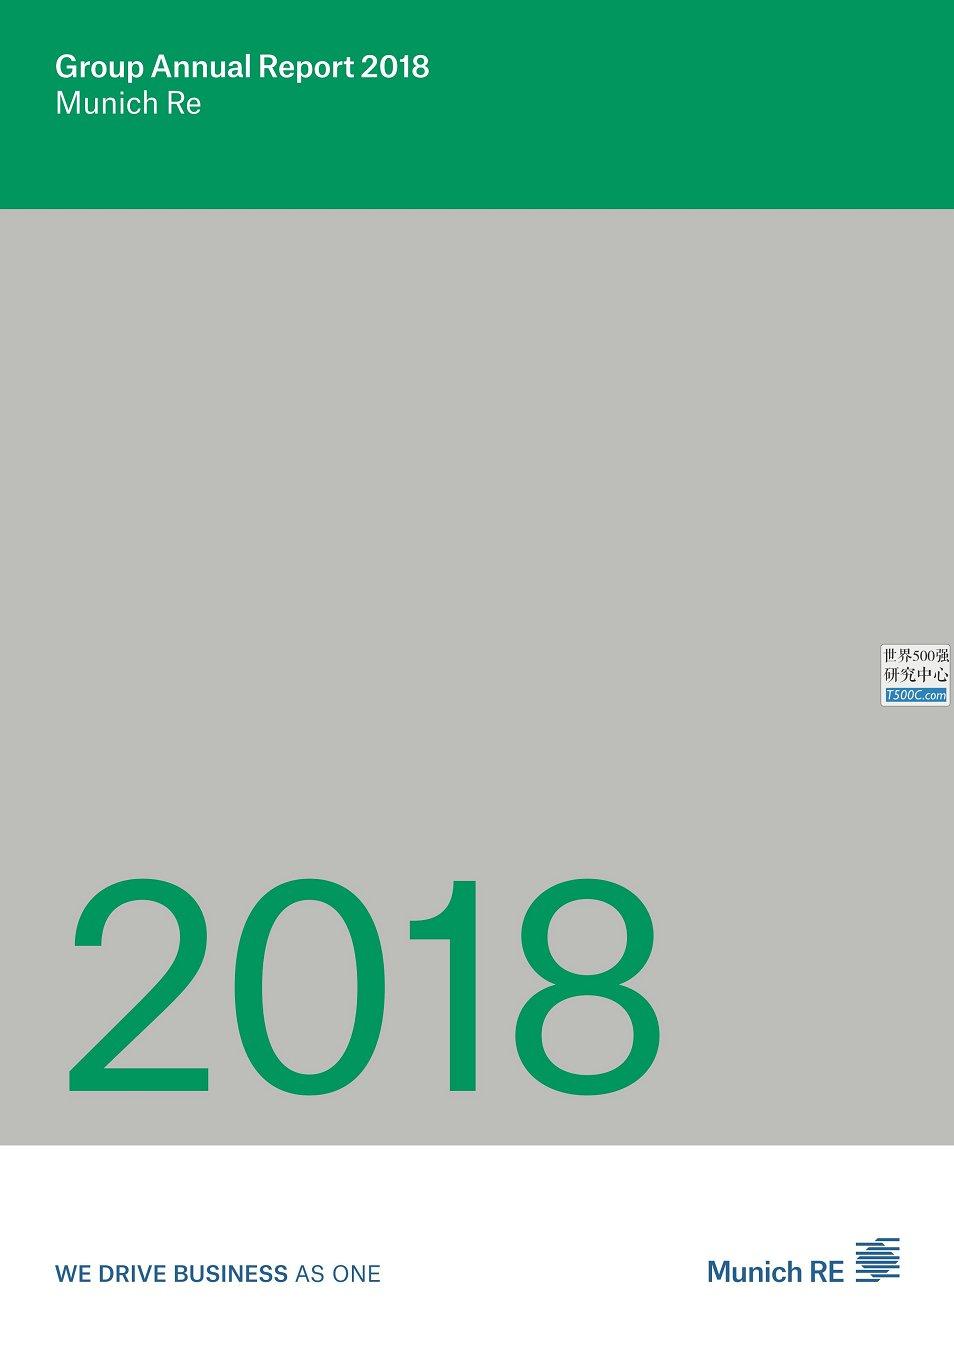 慕尼黑再保险MunichRe_年报AnnualReport_2018